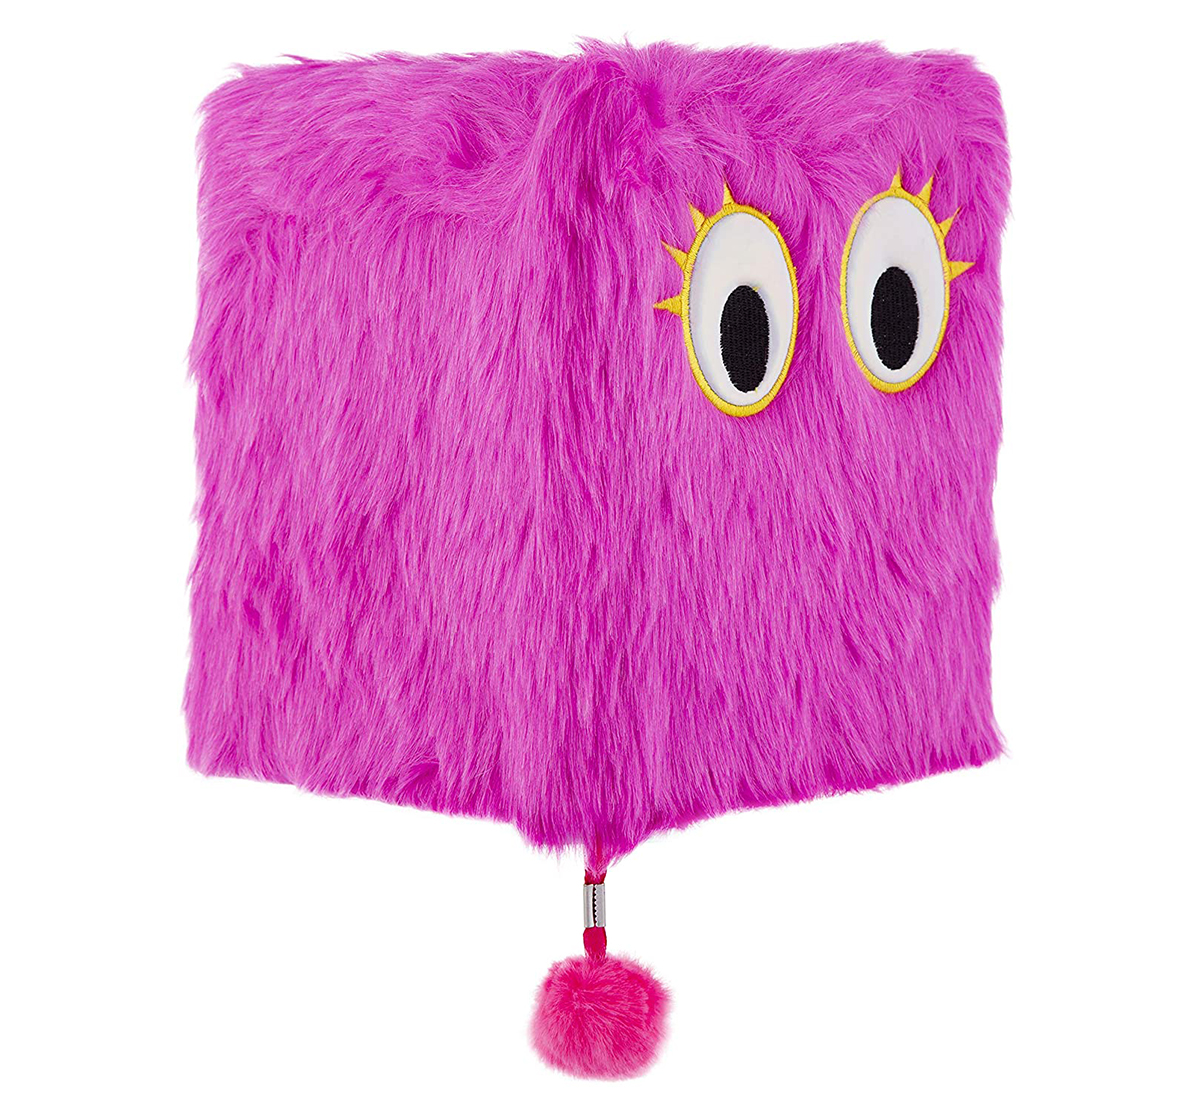 Mirada | Mirada  Fluffy Plush Study & Desk Accessories for Kids age 3Y+ (Pink)